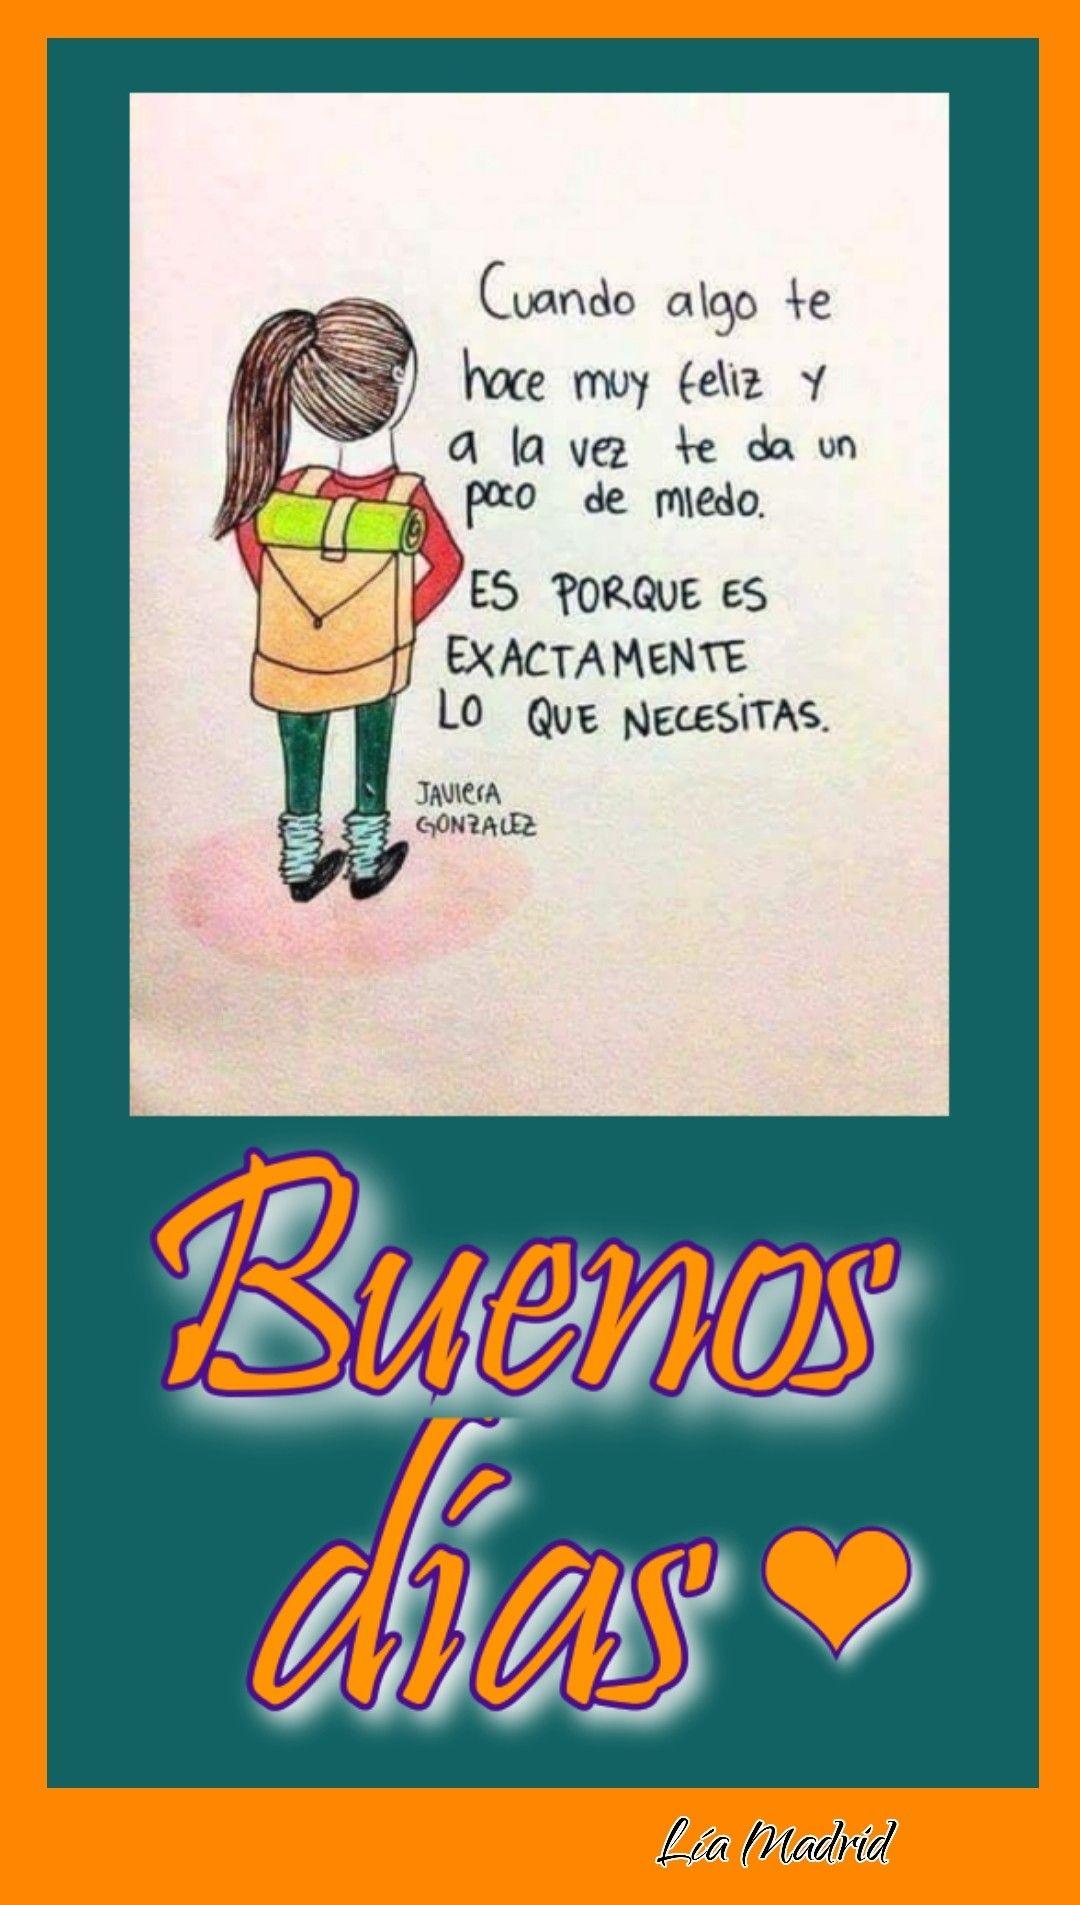 Pin De Roseblack En Buenos Días Mensajes De Buenos Dias